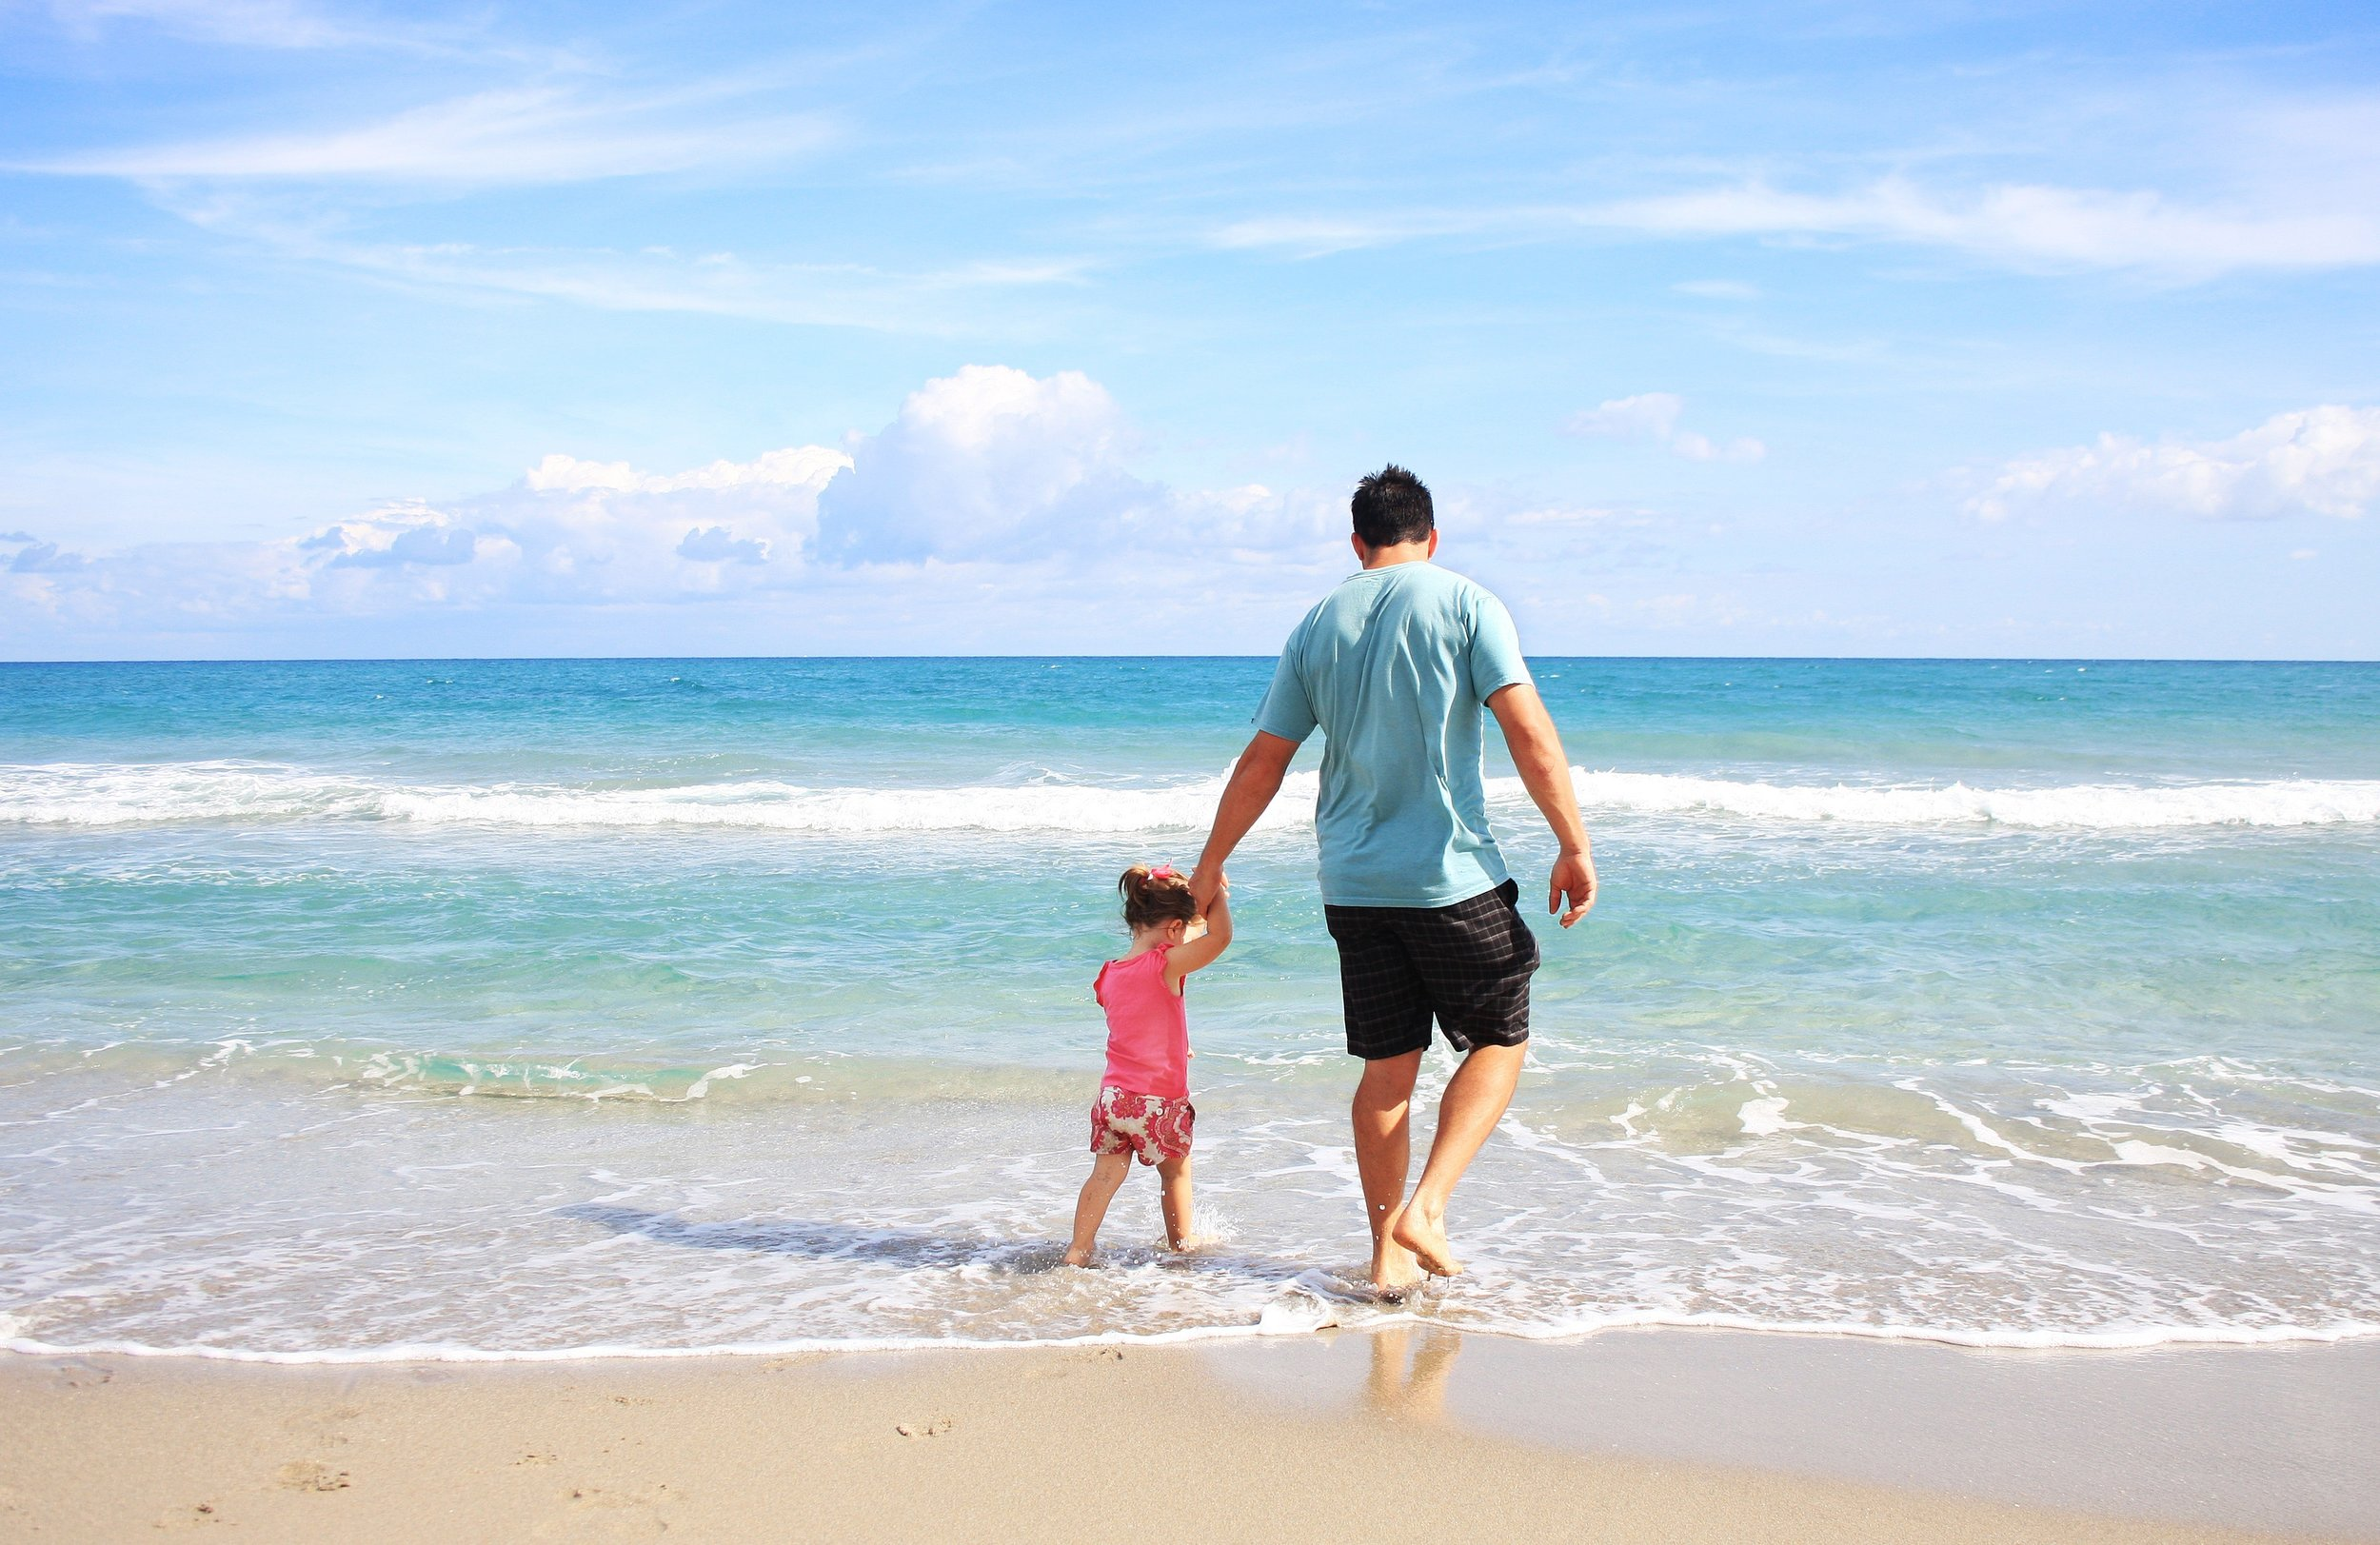 beach-coast-dad-38302.jpg